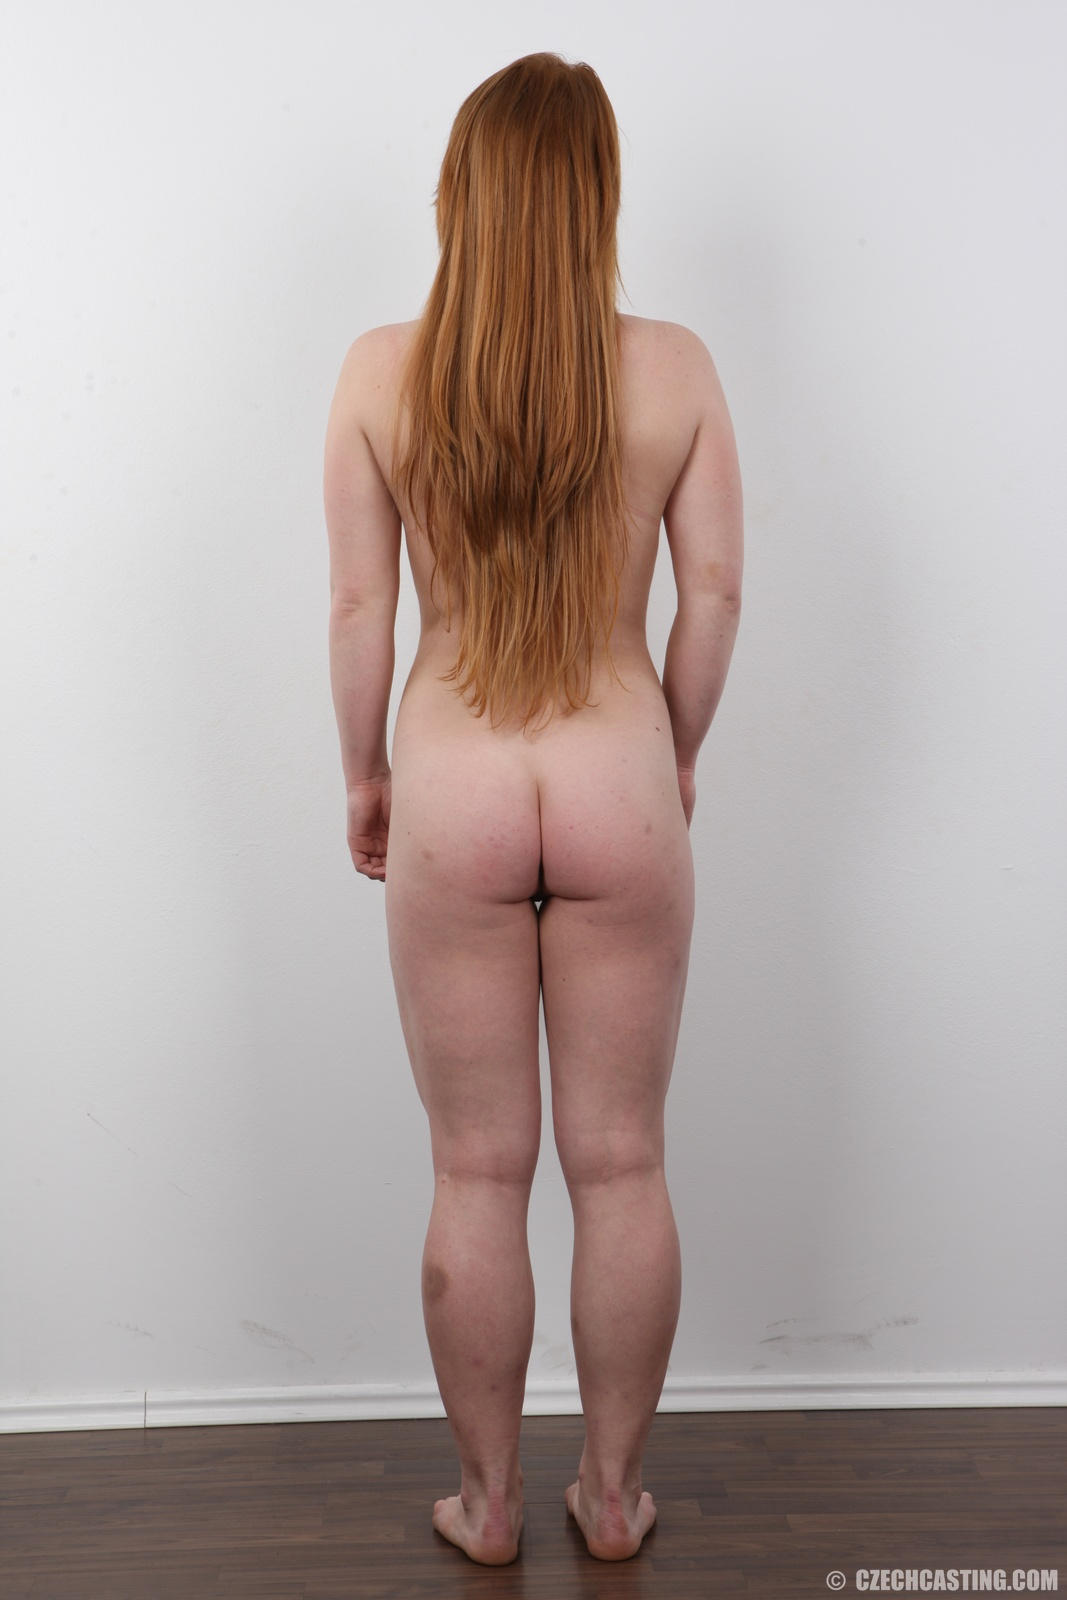 wpid-18-year-old-eliska-casting-photos31.jpg